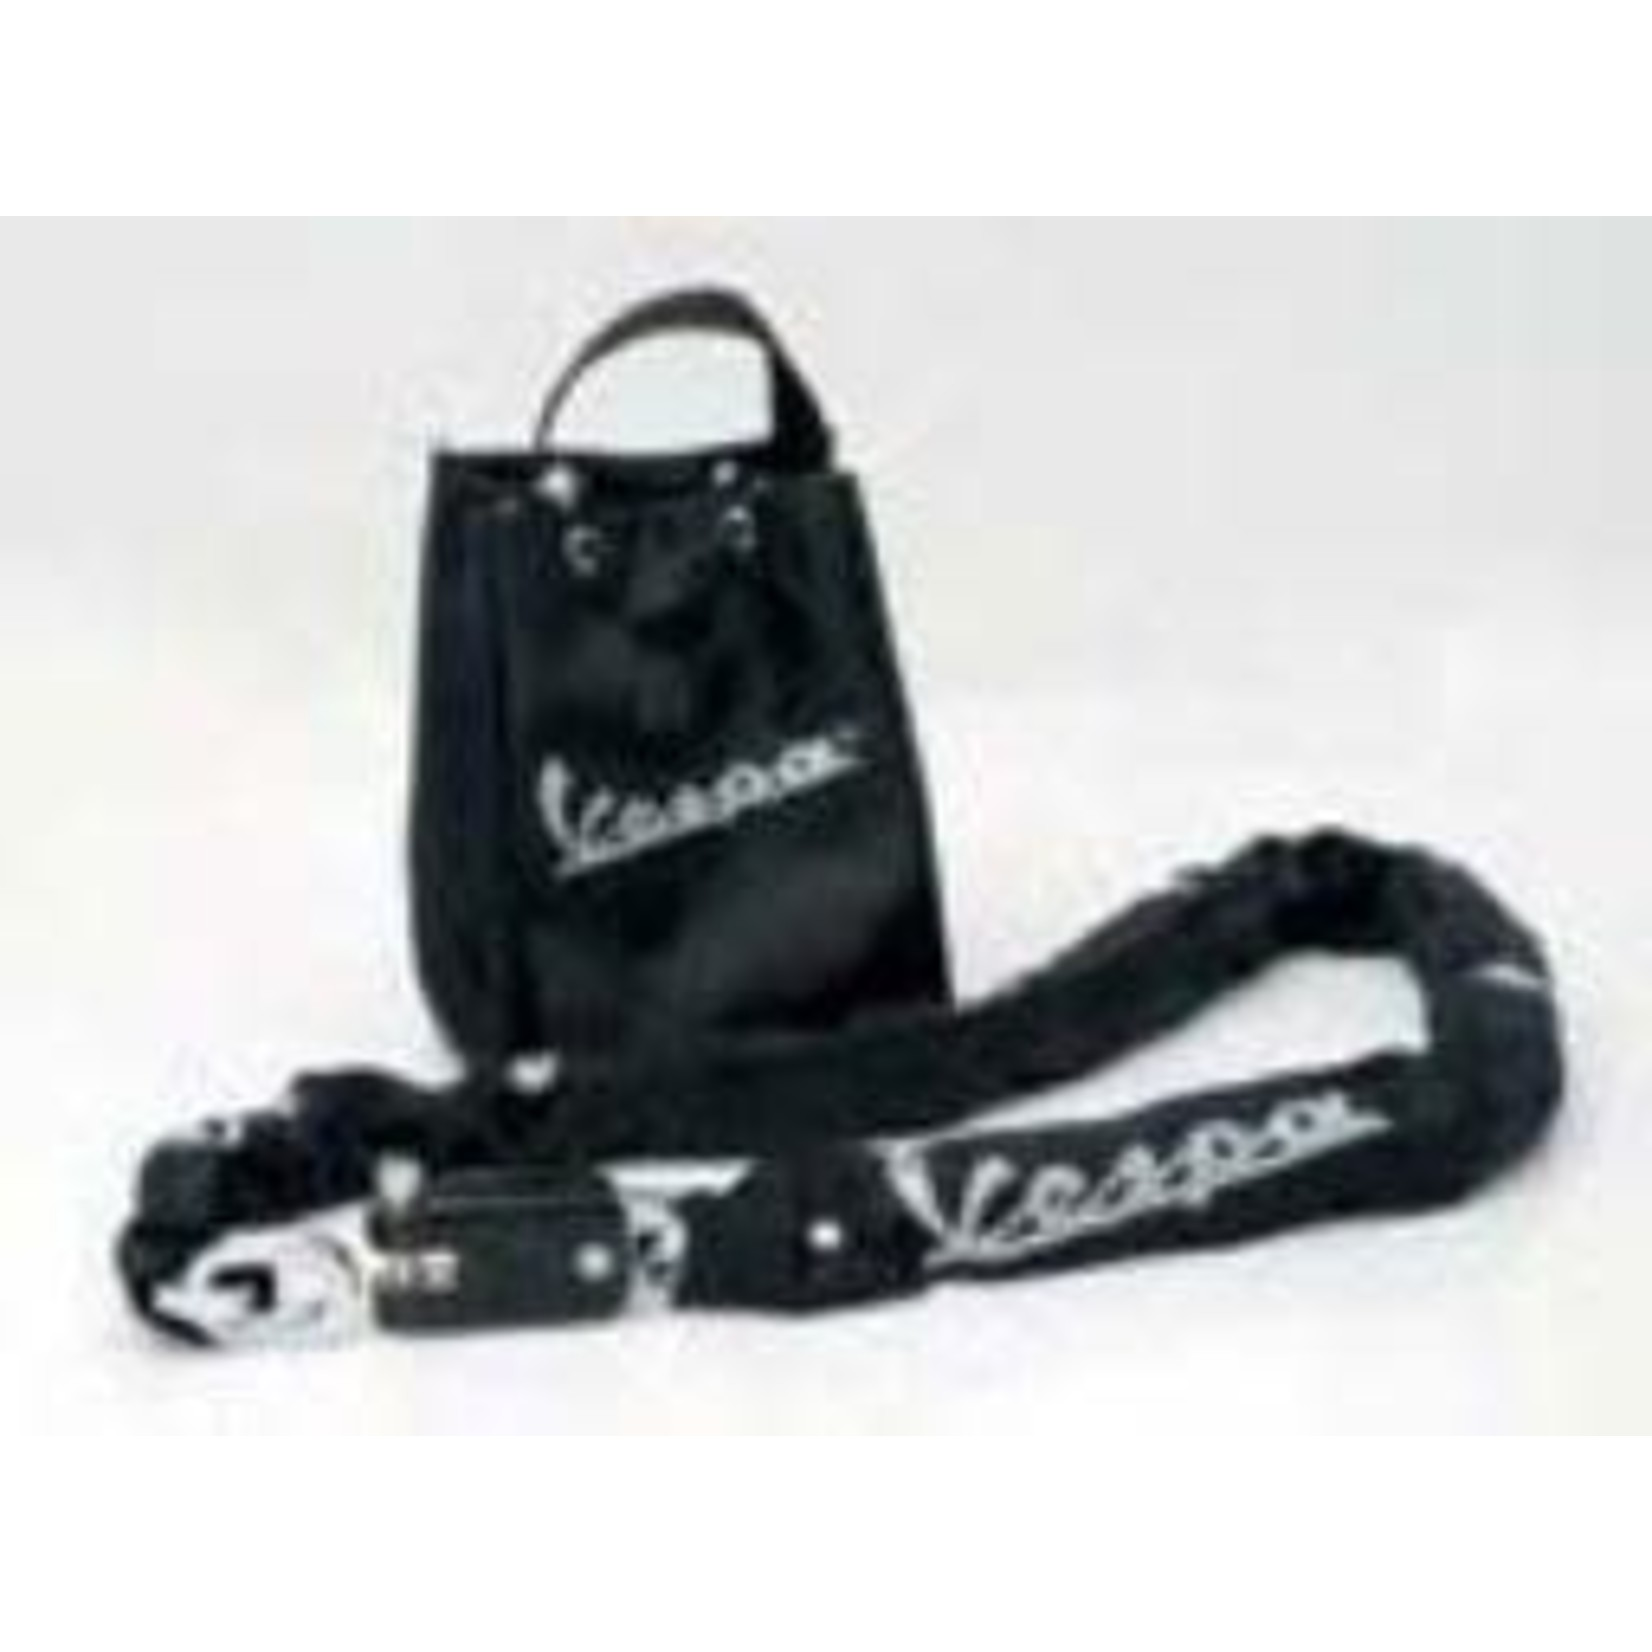 Accessories Lock, Vespa Lock With Bag 120cm